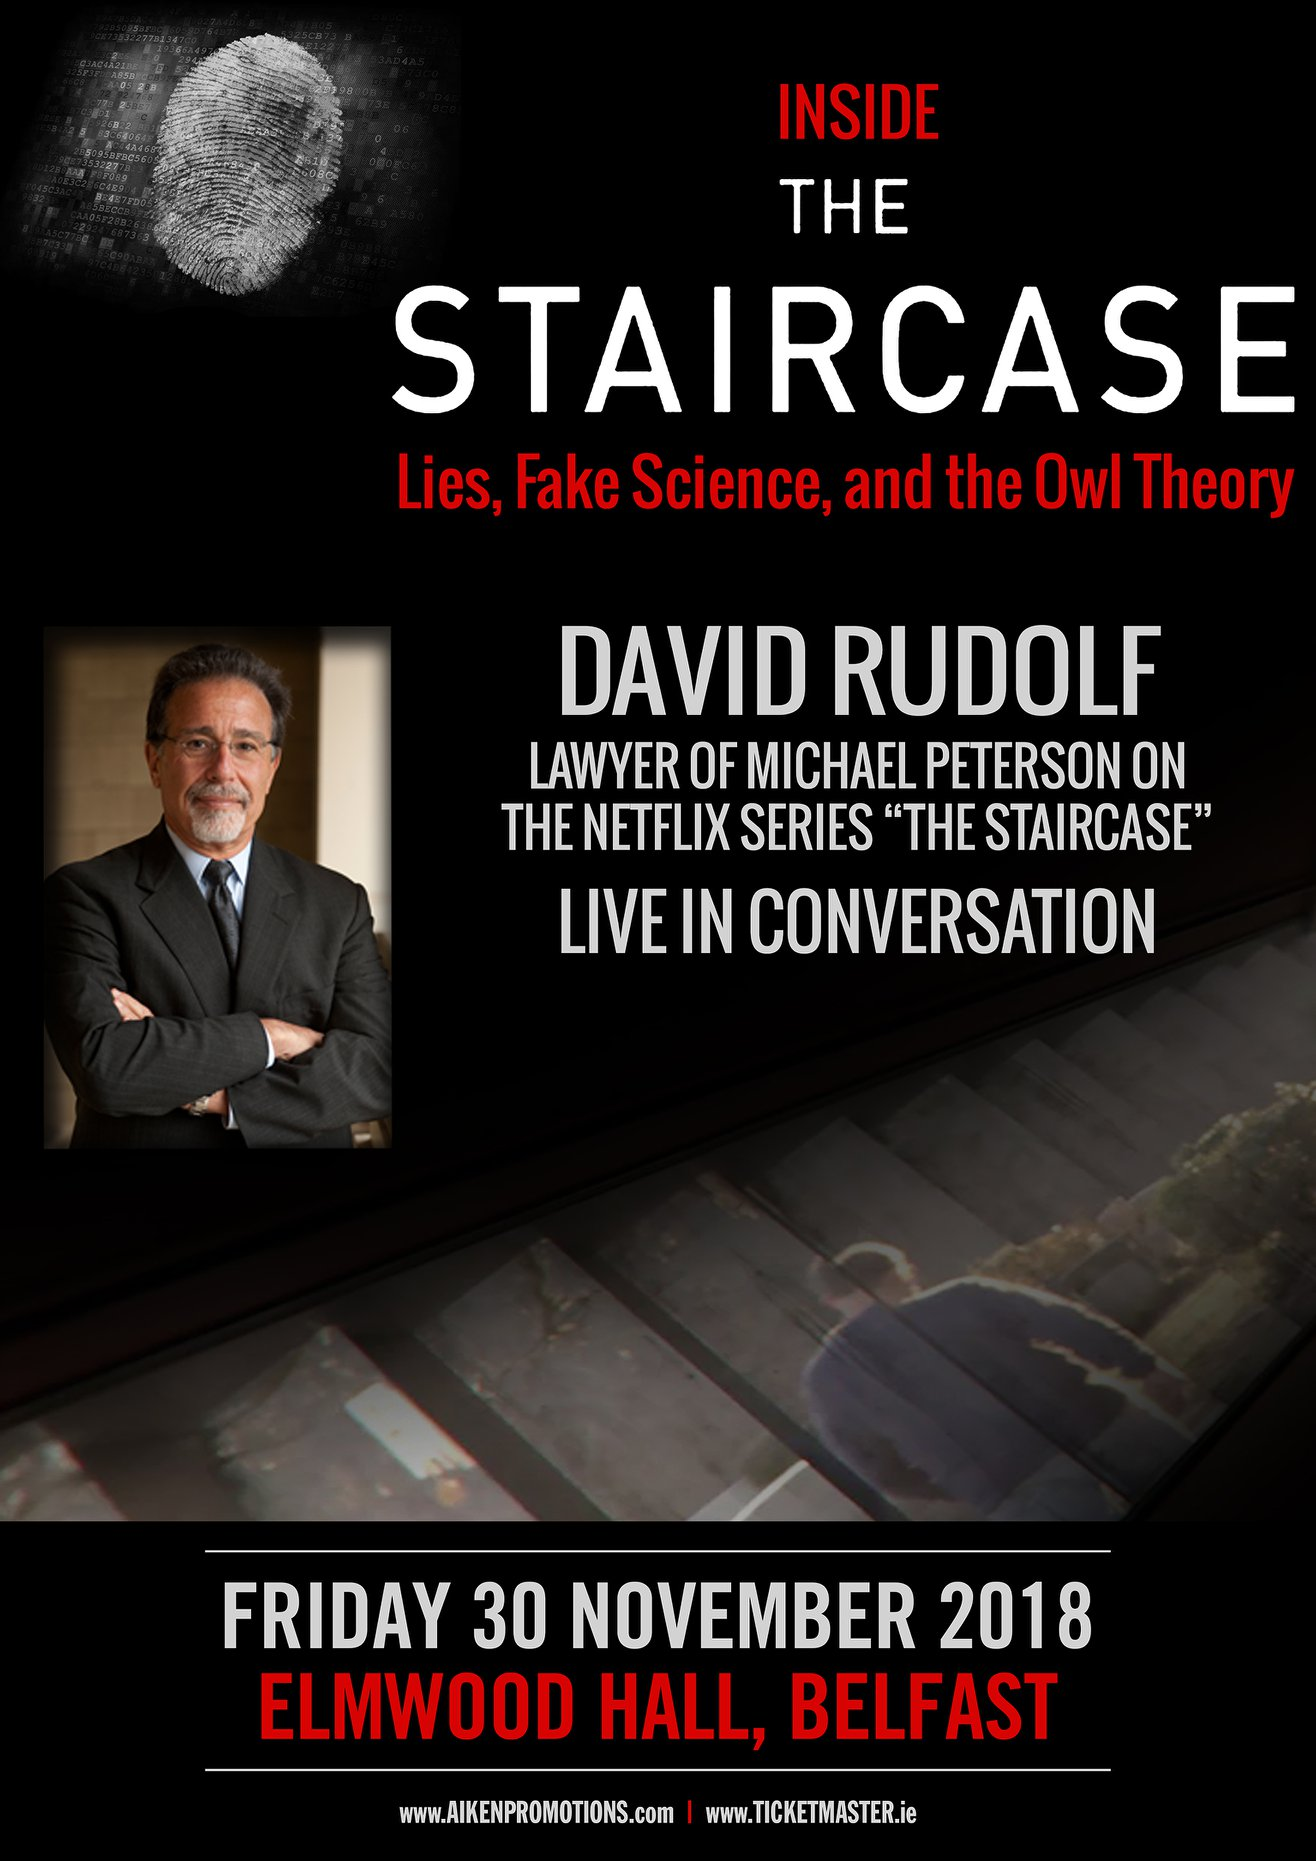 INSIDE THE STAIRCASE DAVID RUDOLF ELMWOOD HALL.jpg